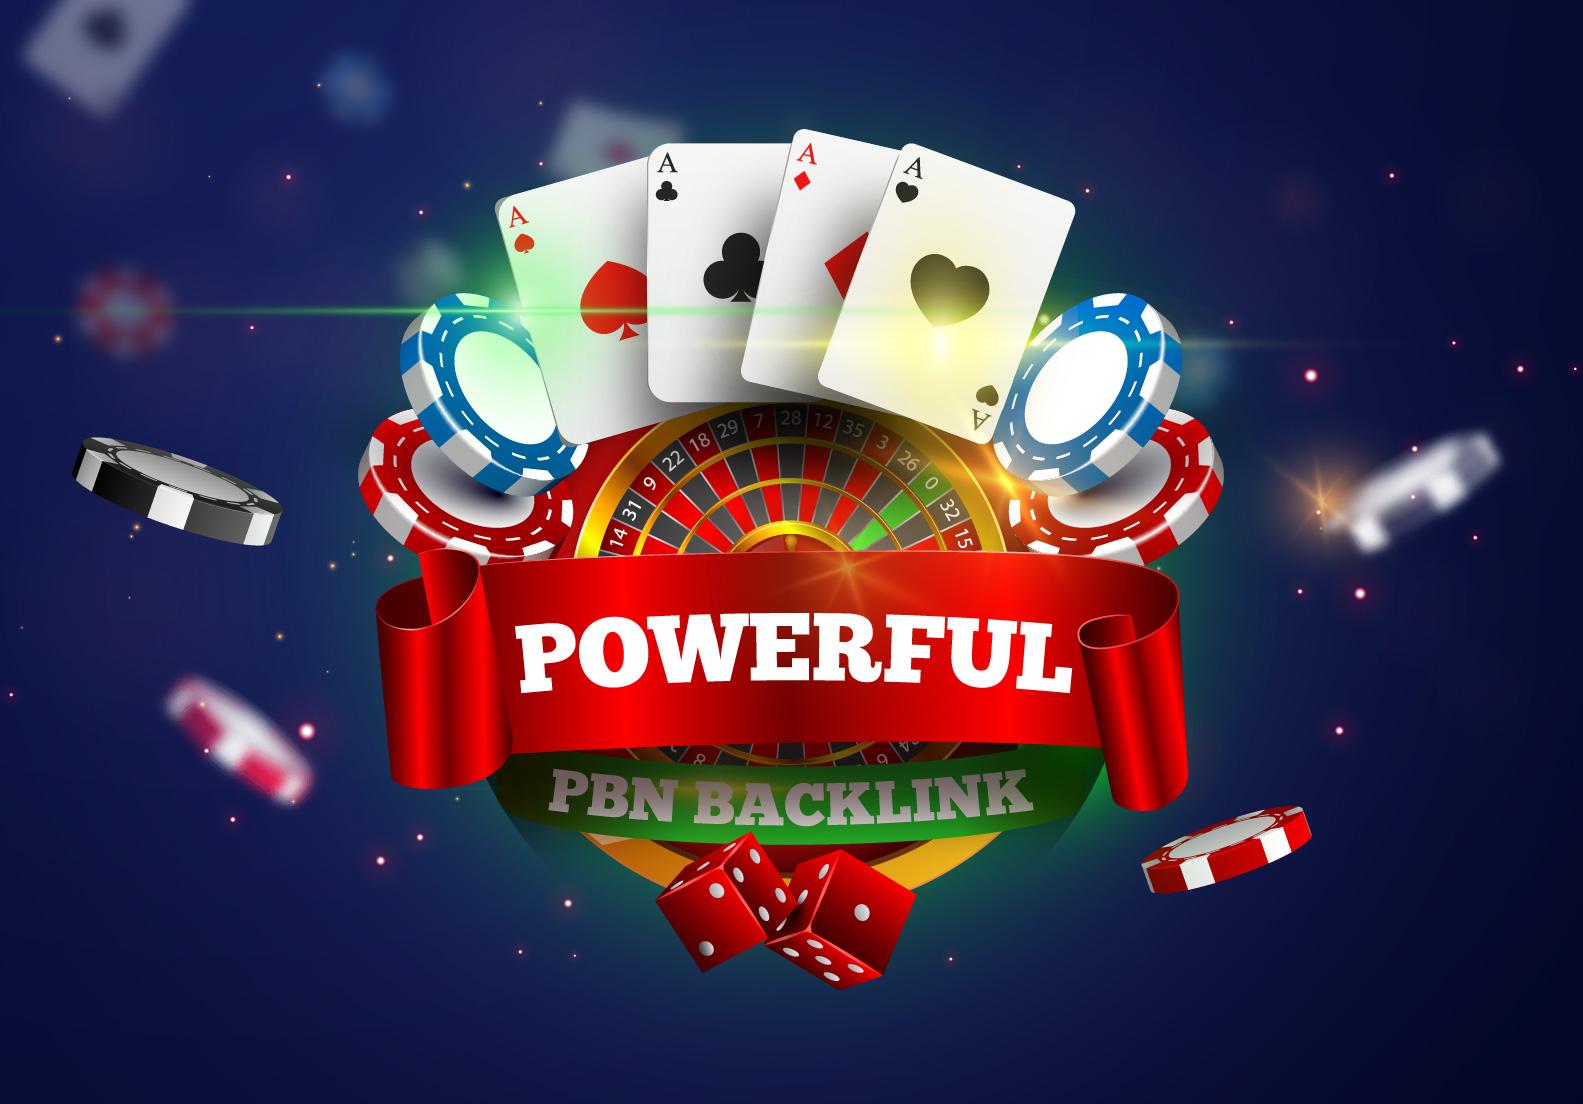 Rank your website with 999 PBNs Casino Online Poker Esports Betting Gambling Websites